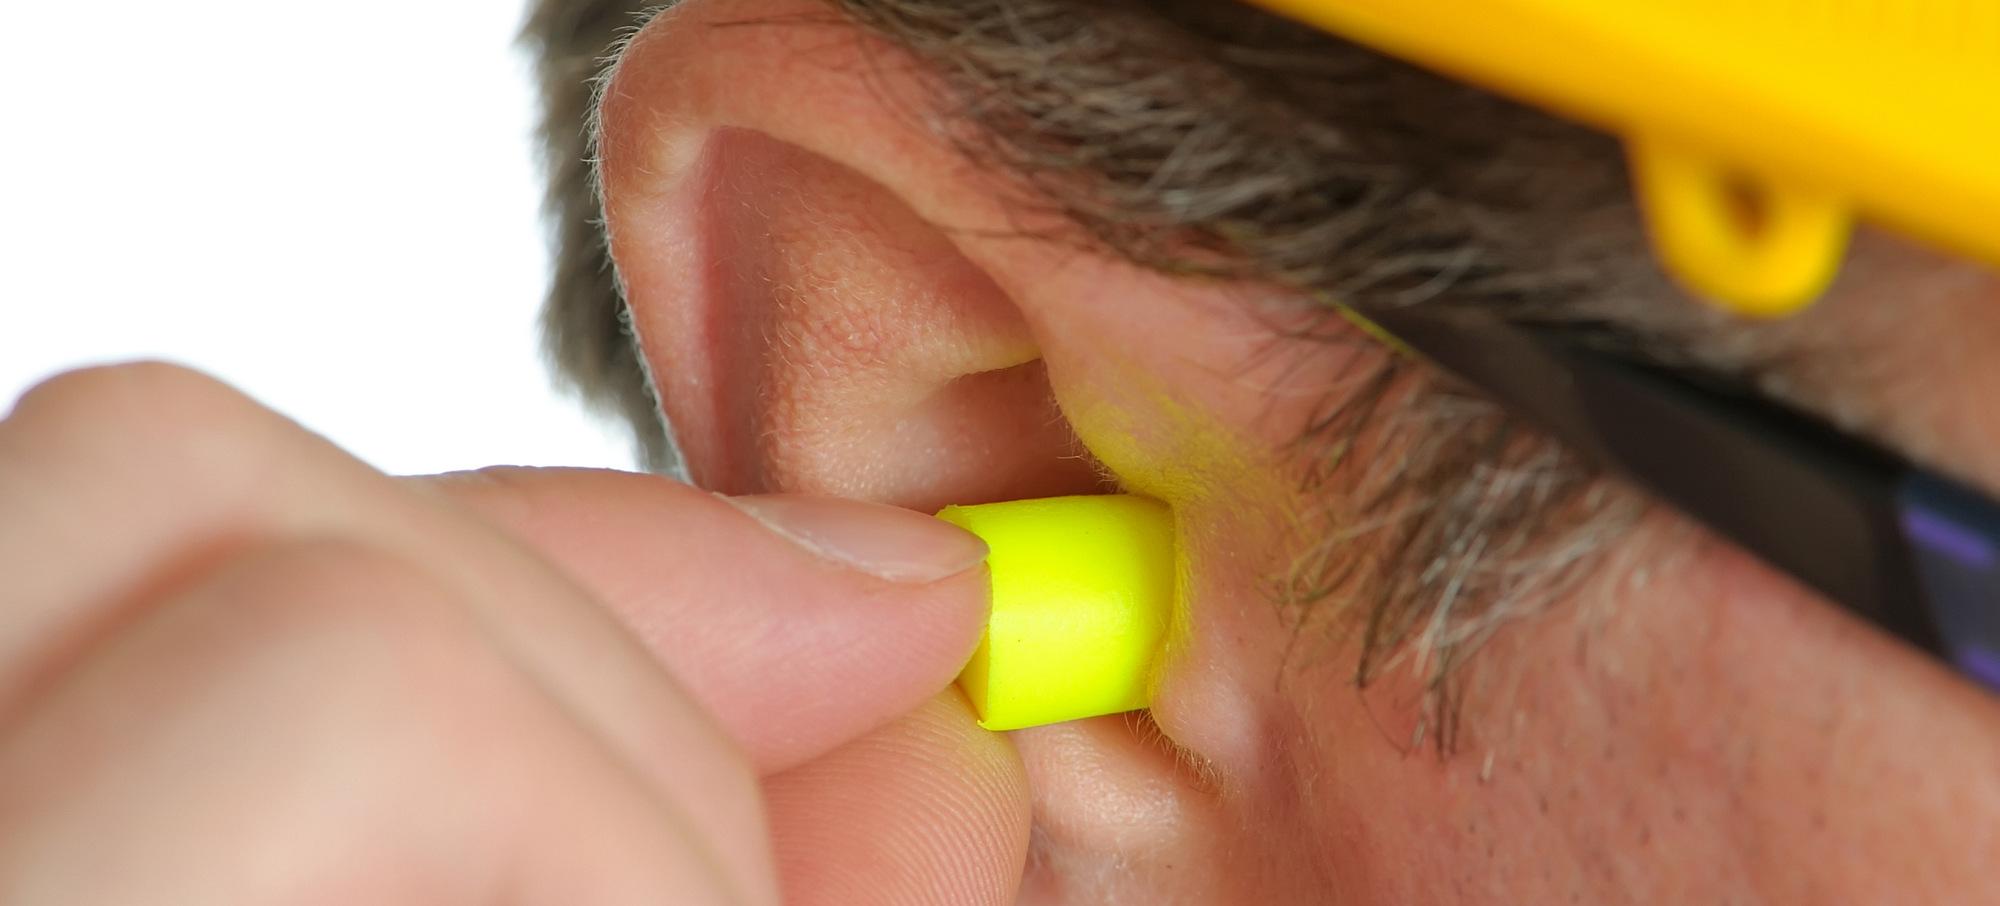 8-trabalhos-perda-auditiva